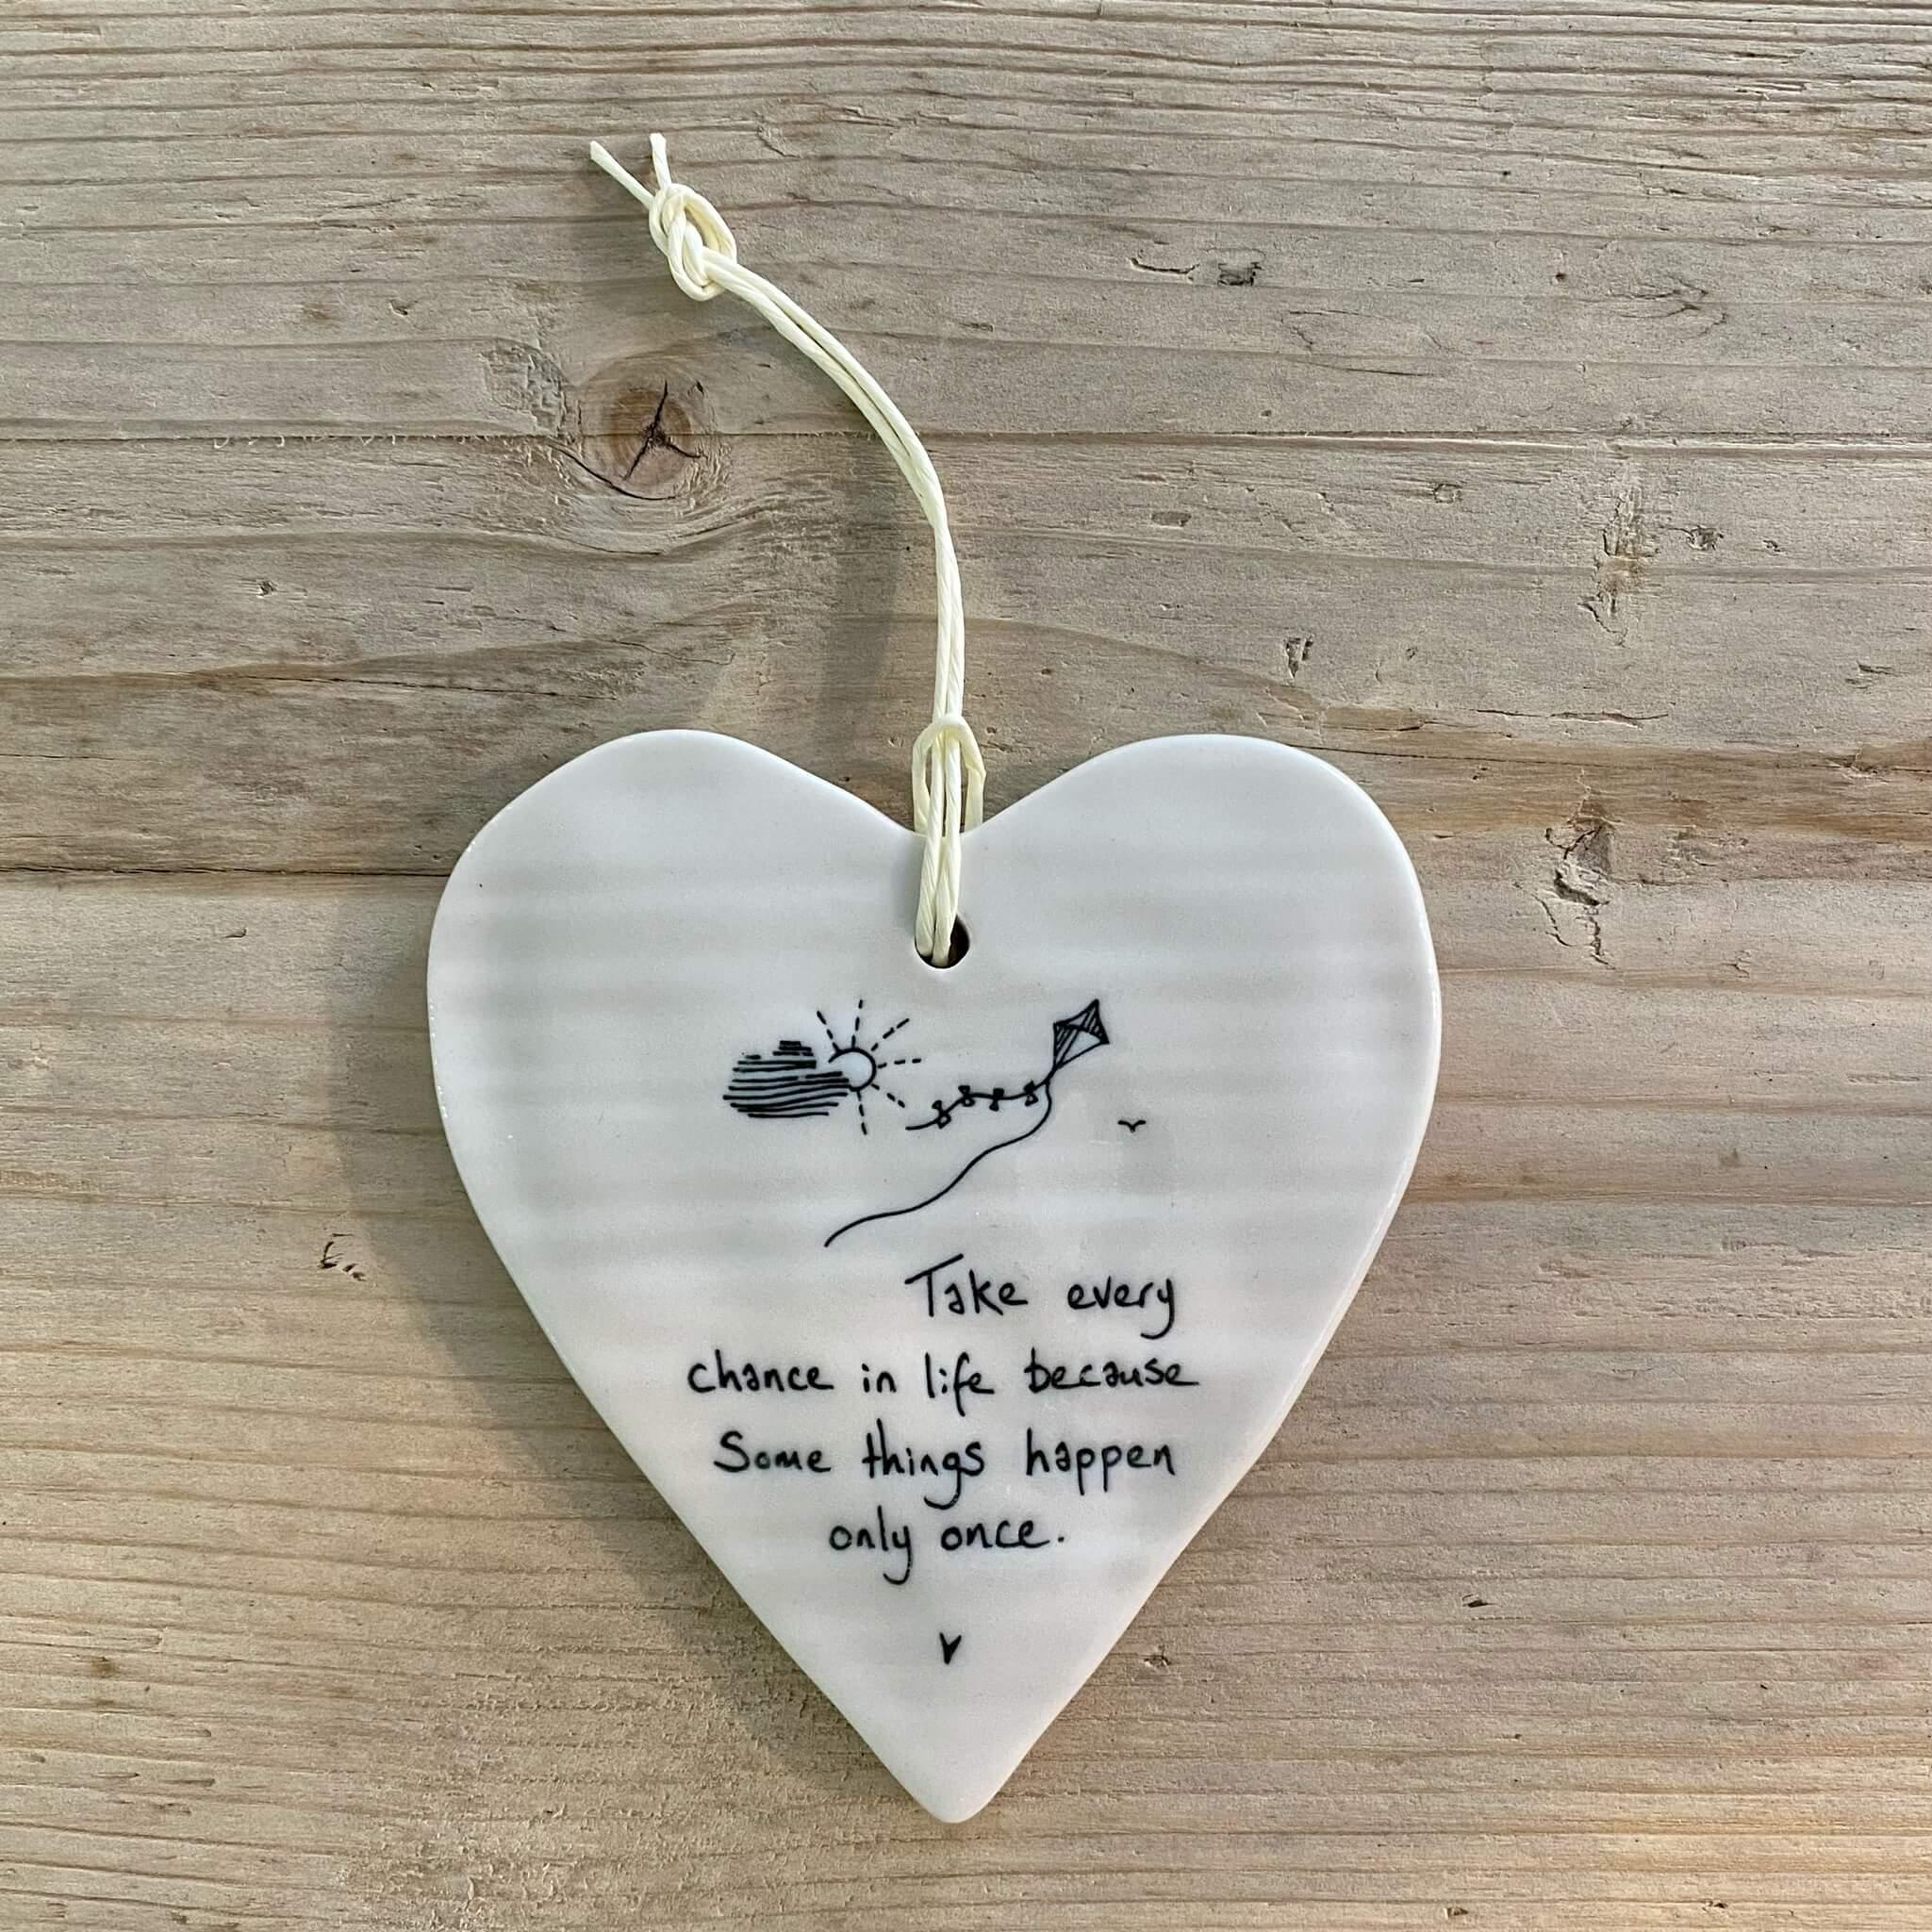 Porcelain Heart - Take every chance